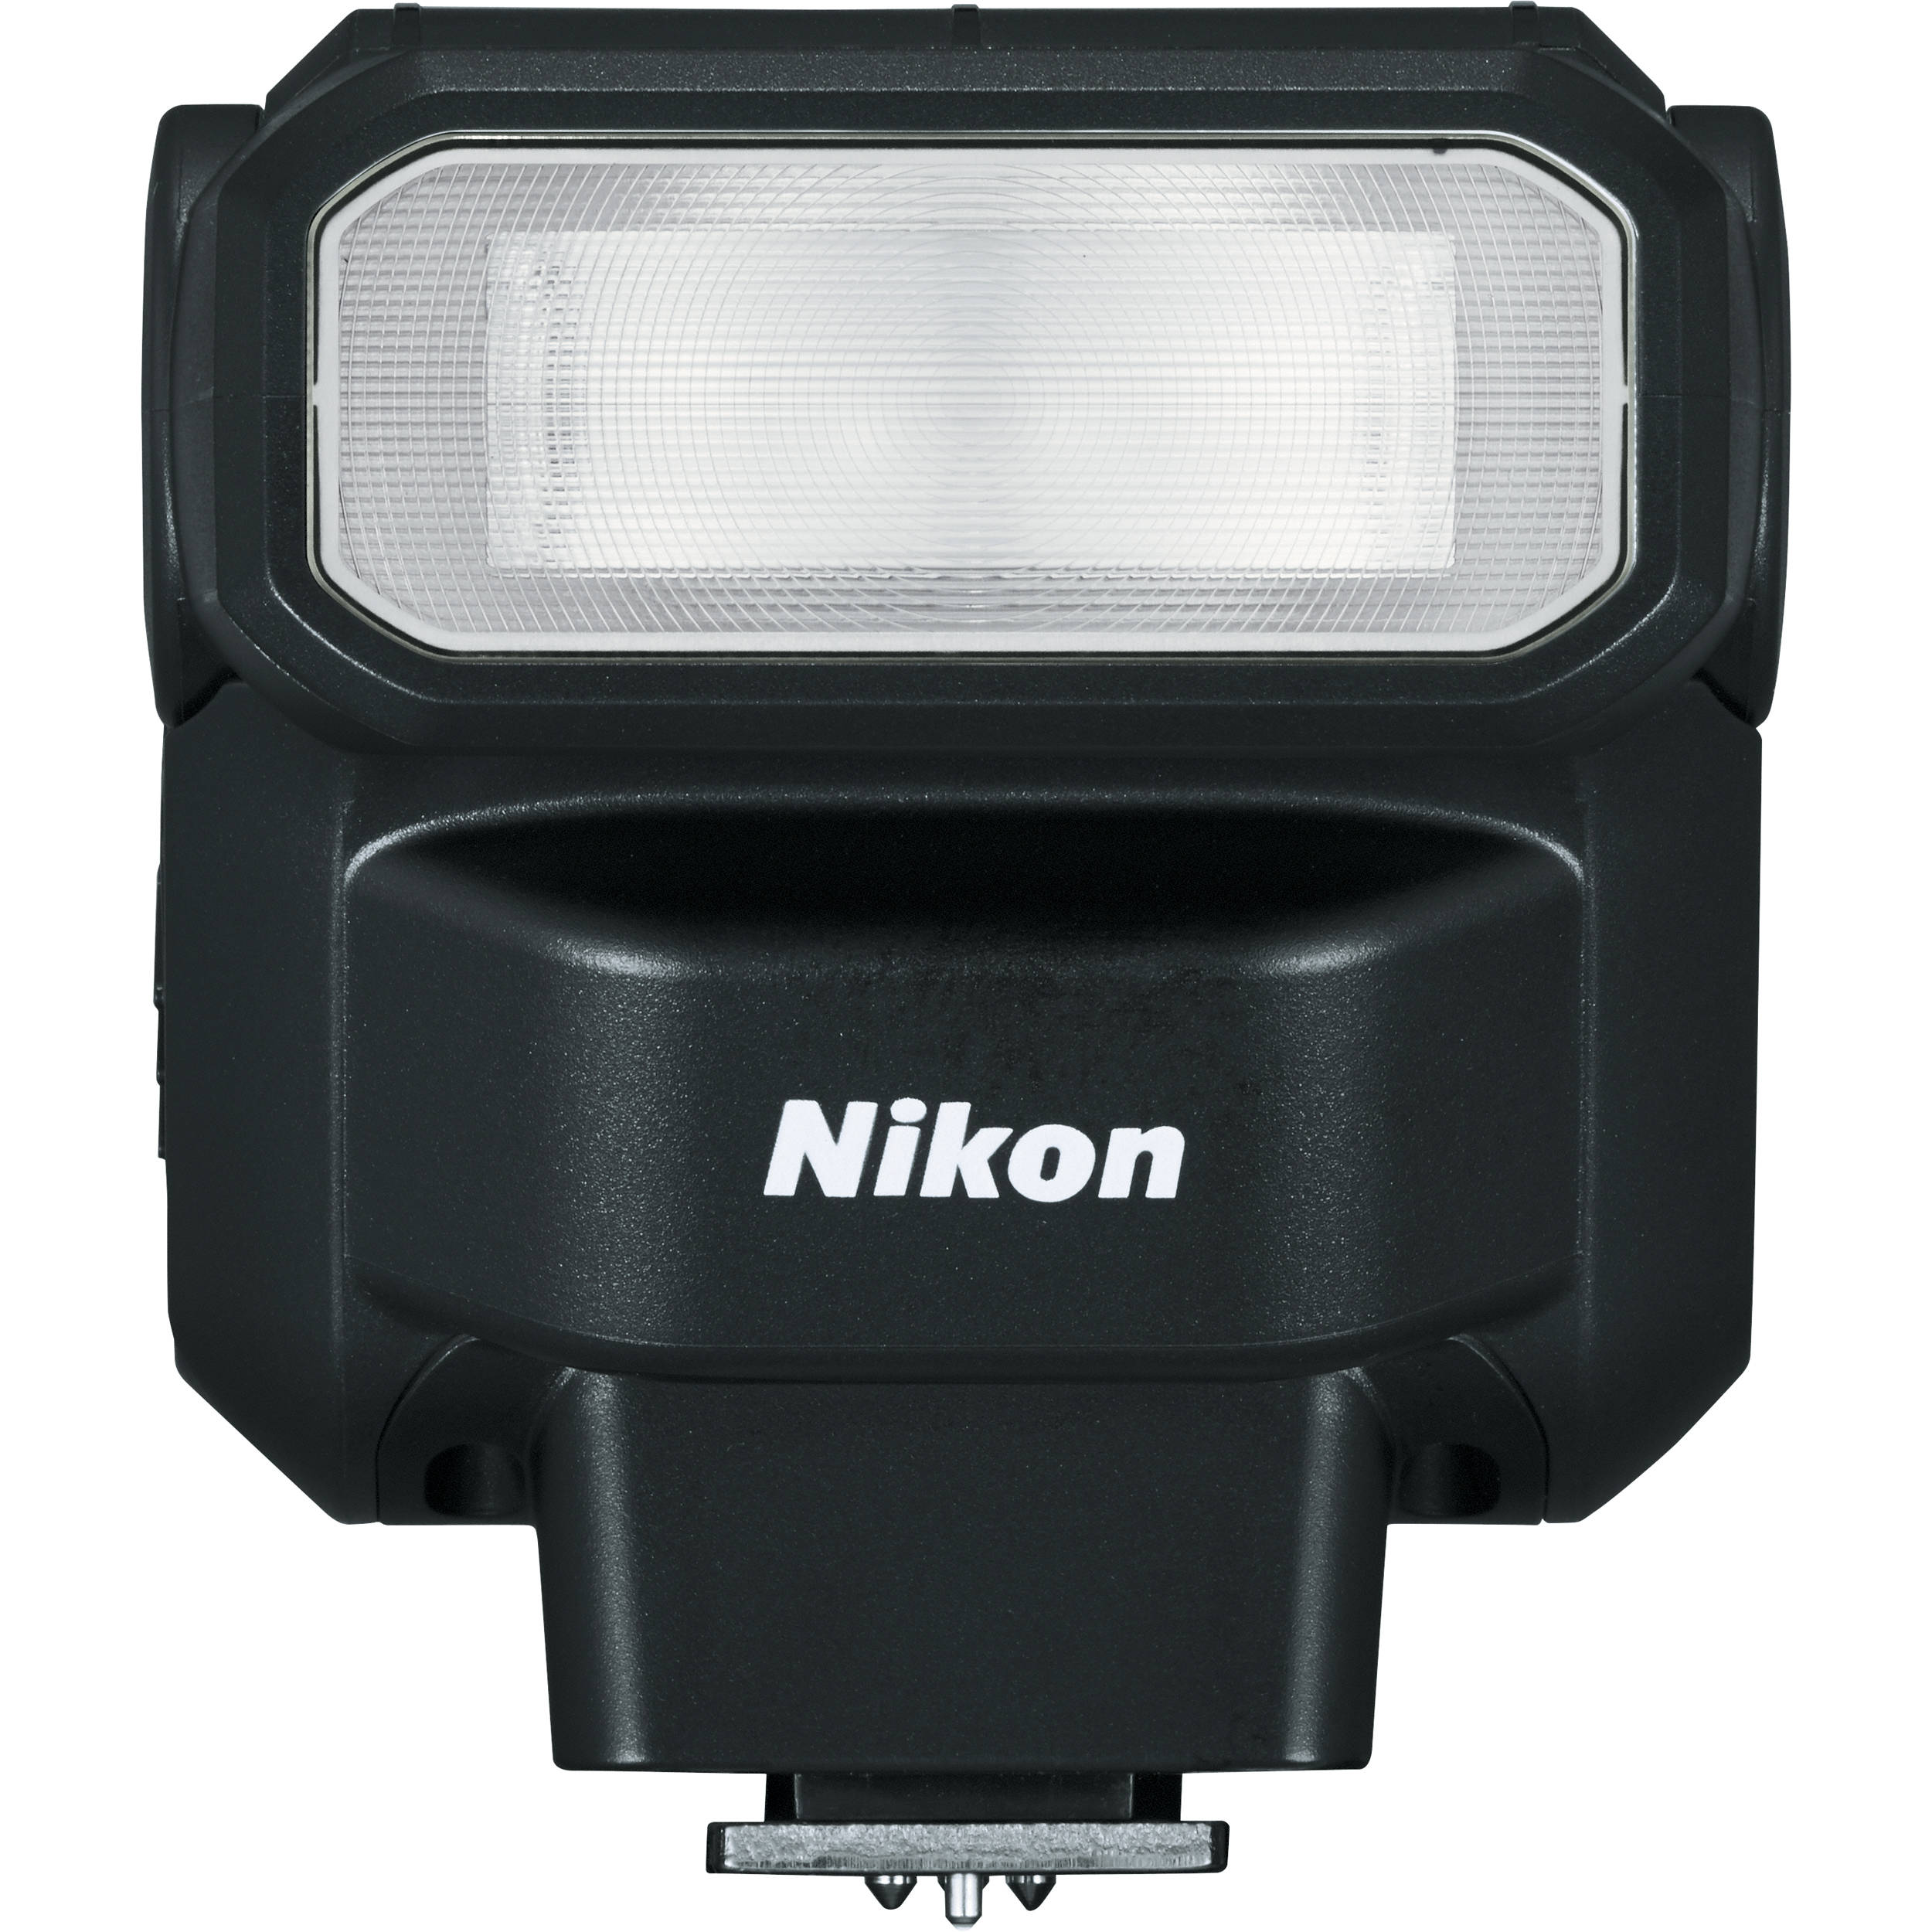 Nikon Sb Af Speedlight